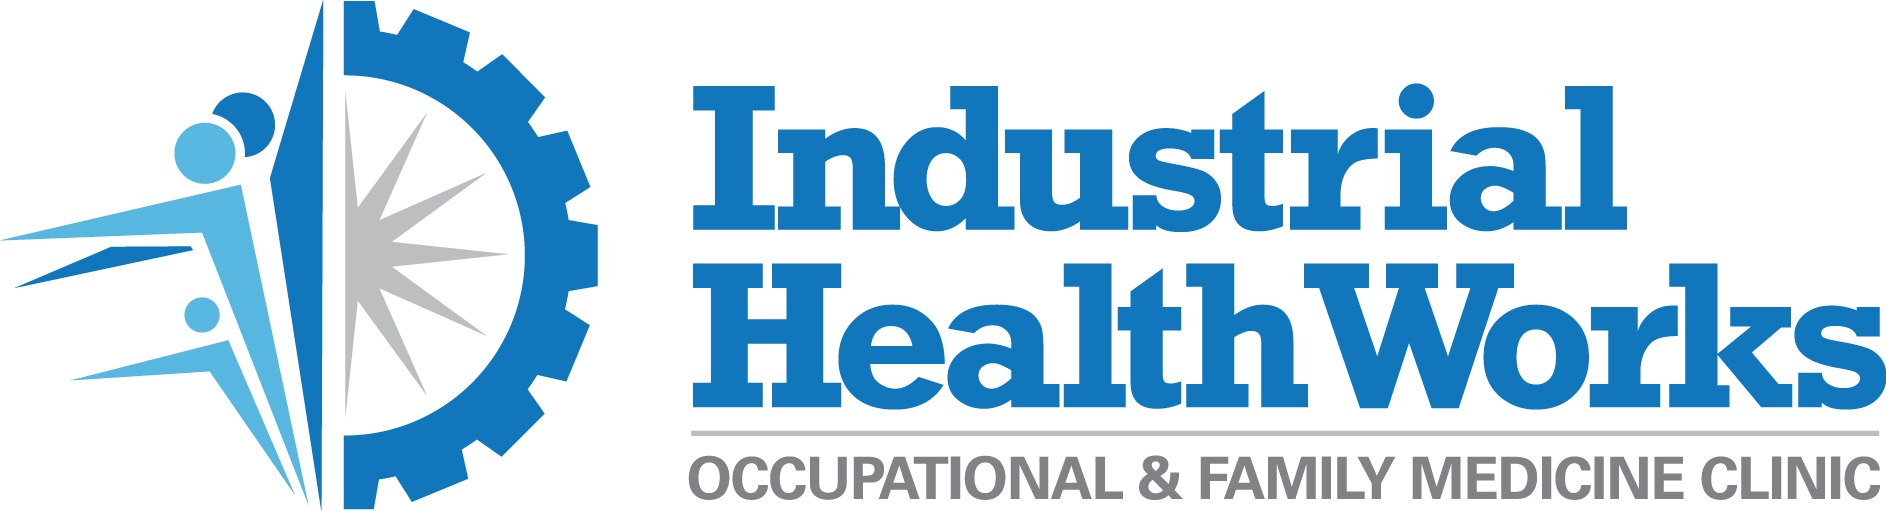 Mcallen industrial health works mcallen 1betcityfo Gallery